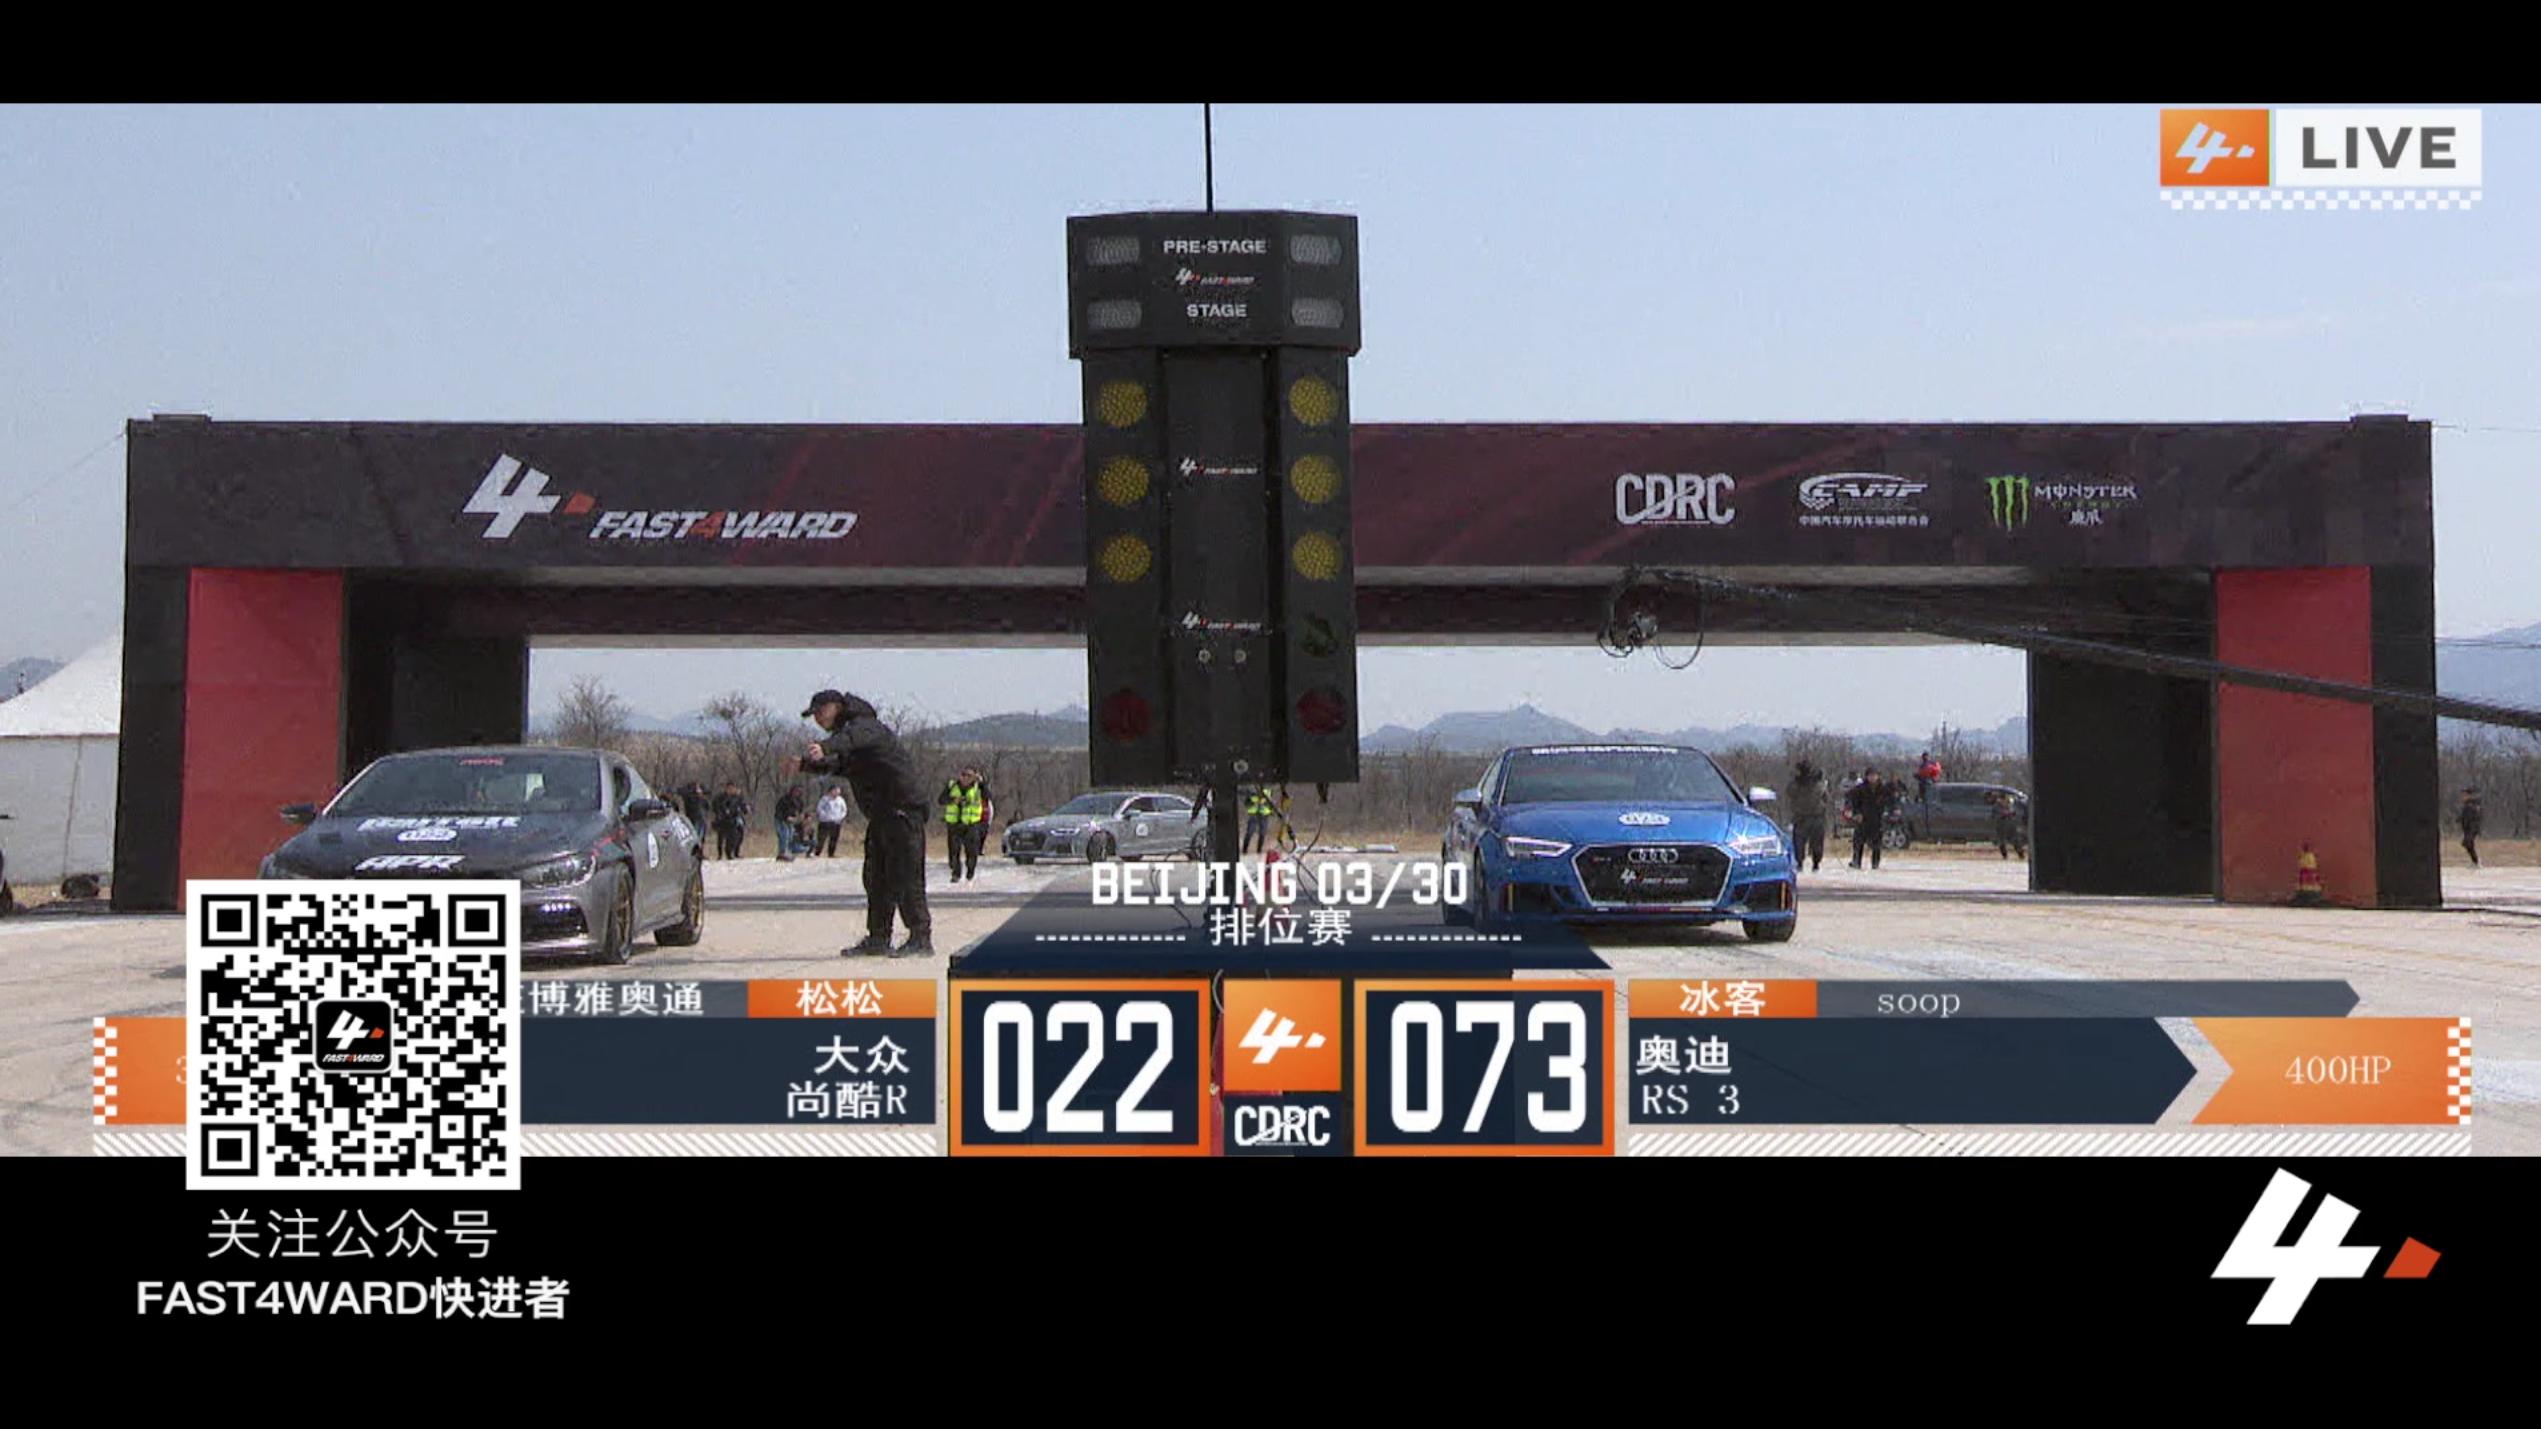 FAST4WARD  北京站 大众尚酷r  vs 奥迪rs3